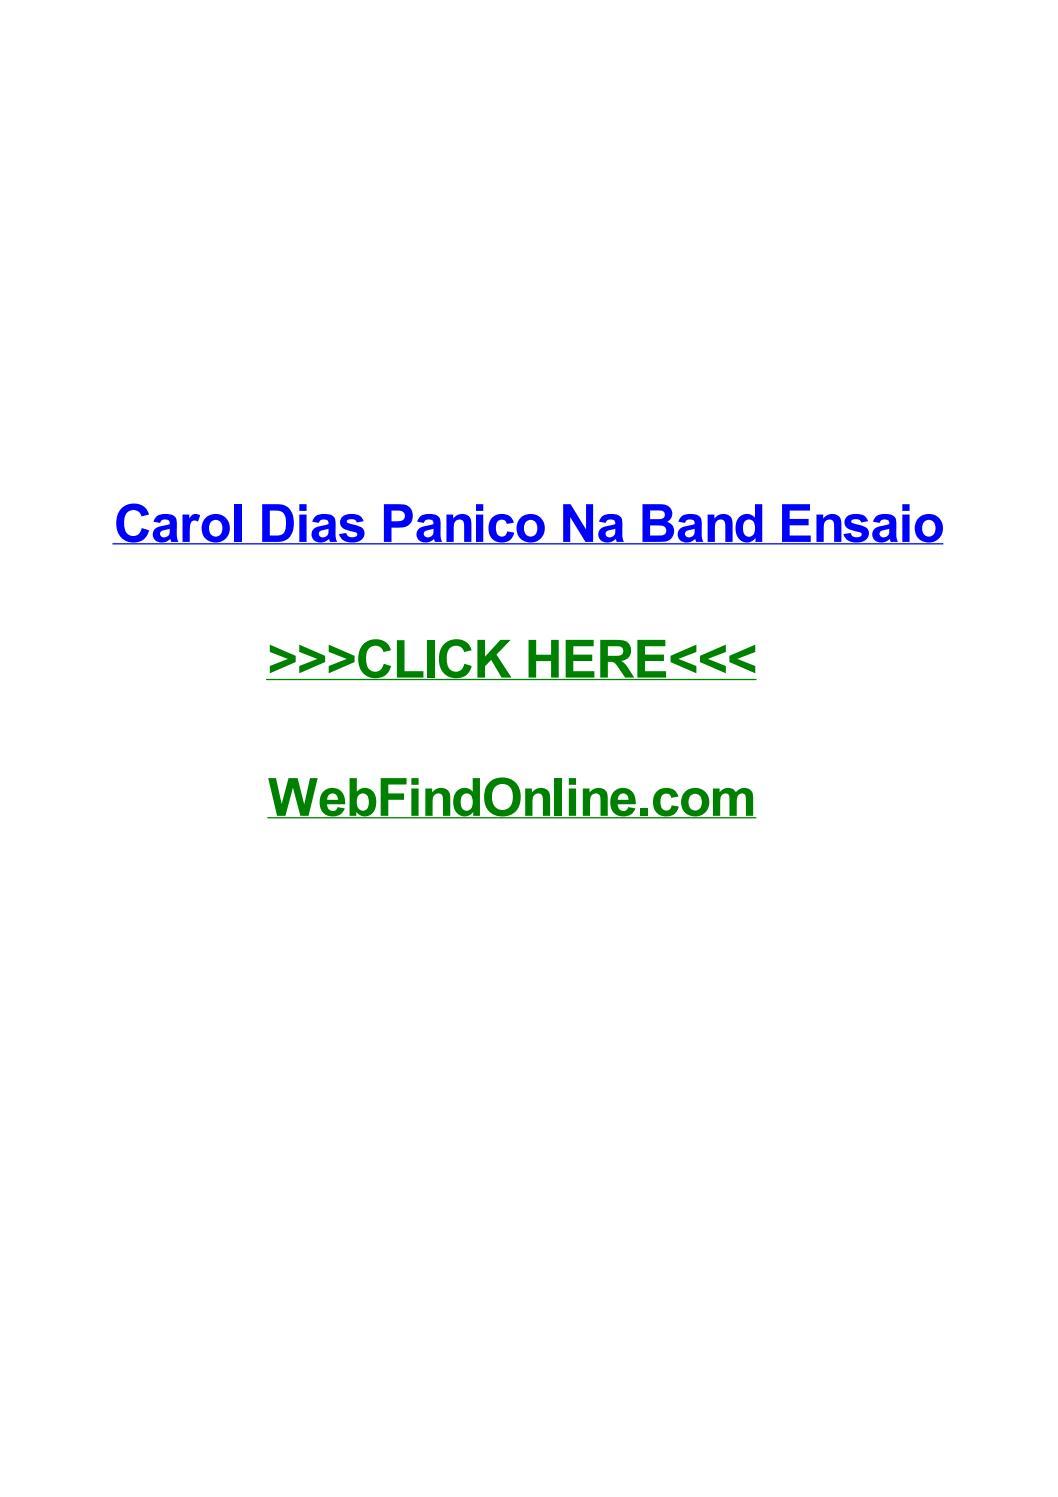 Carol dias panico na band ensaio by tonyjjir issuu fandeluxe Images